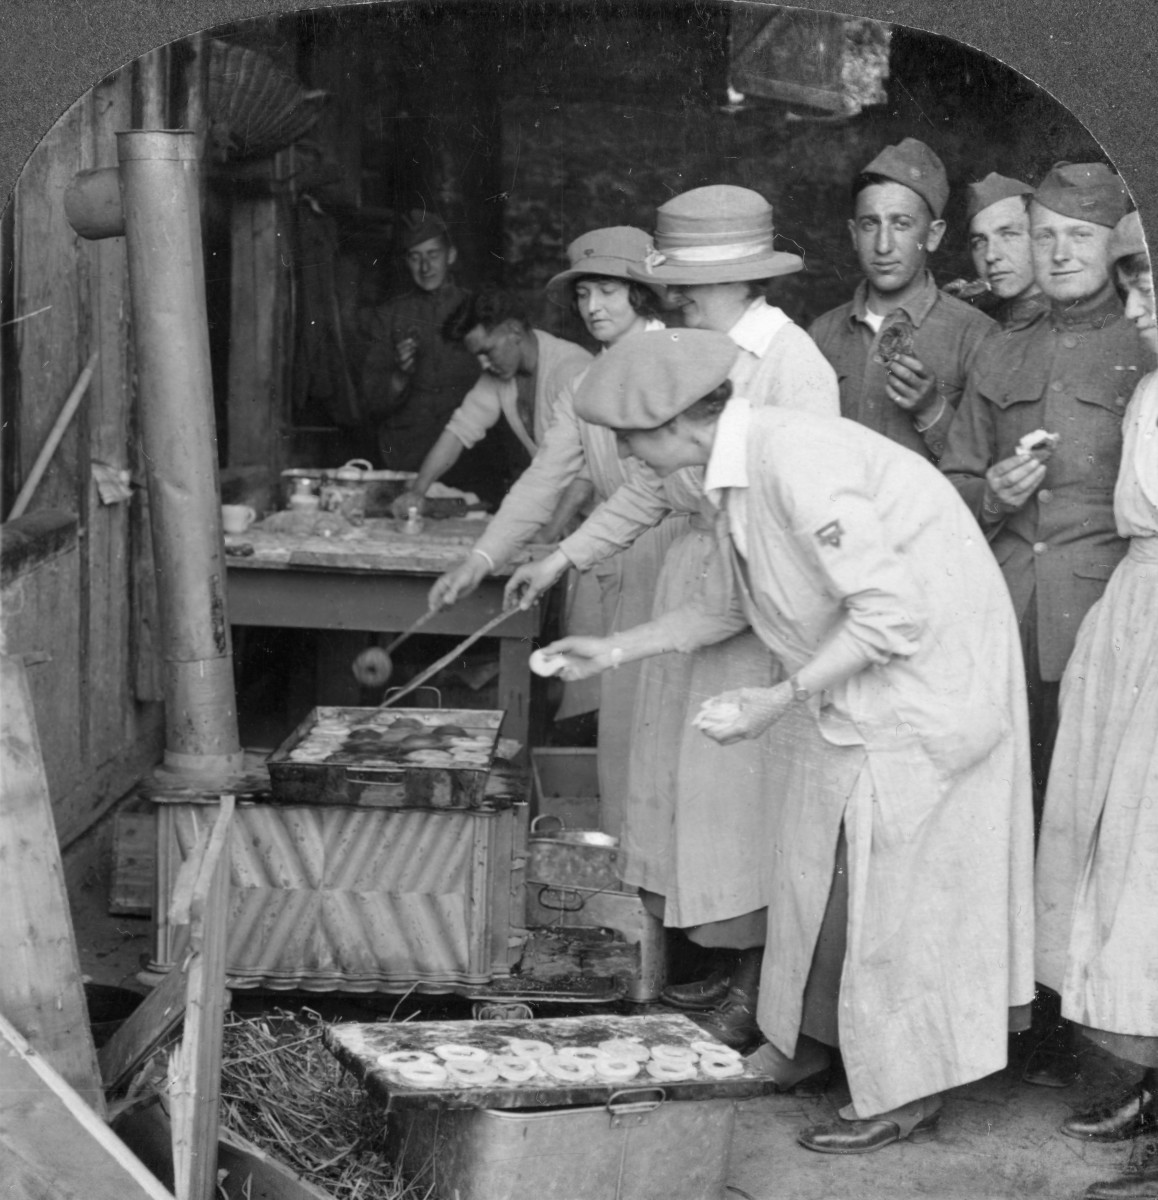 """Doughnuts for Doughboys"": Montabaur on the Rhine, Germany, circa 1918-1919."